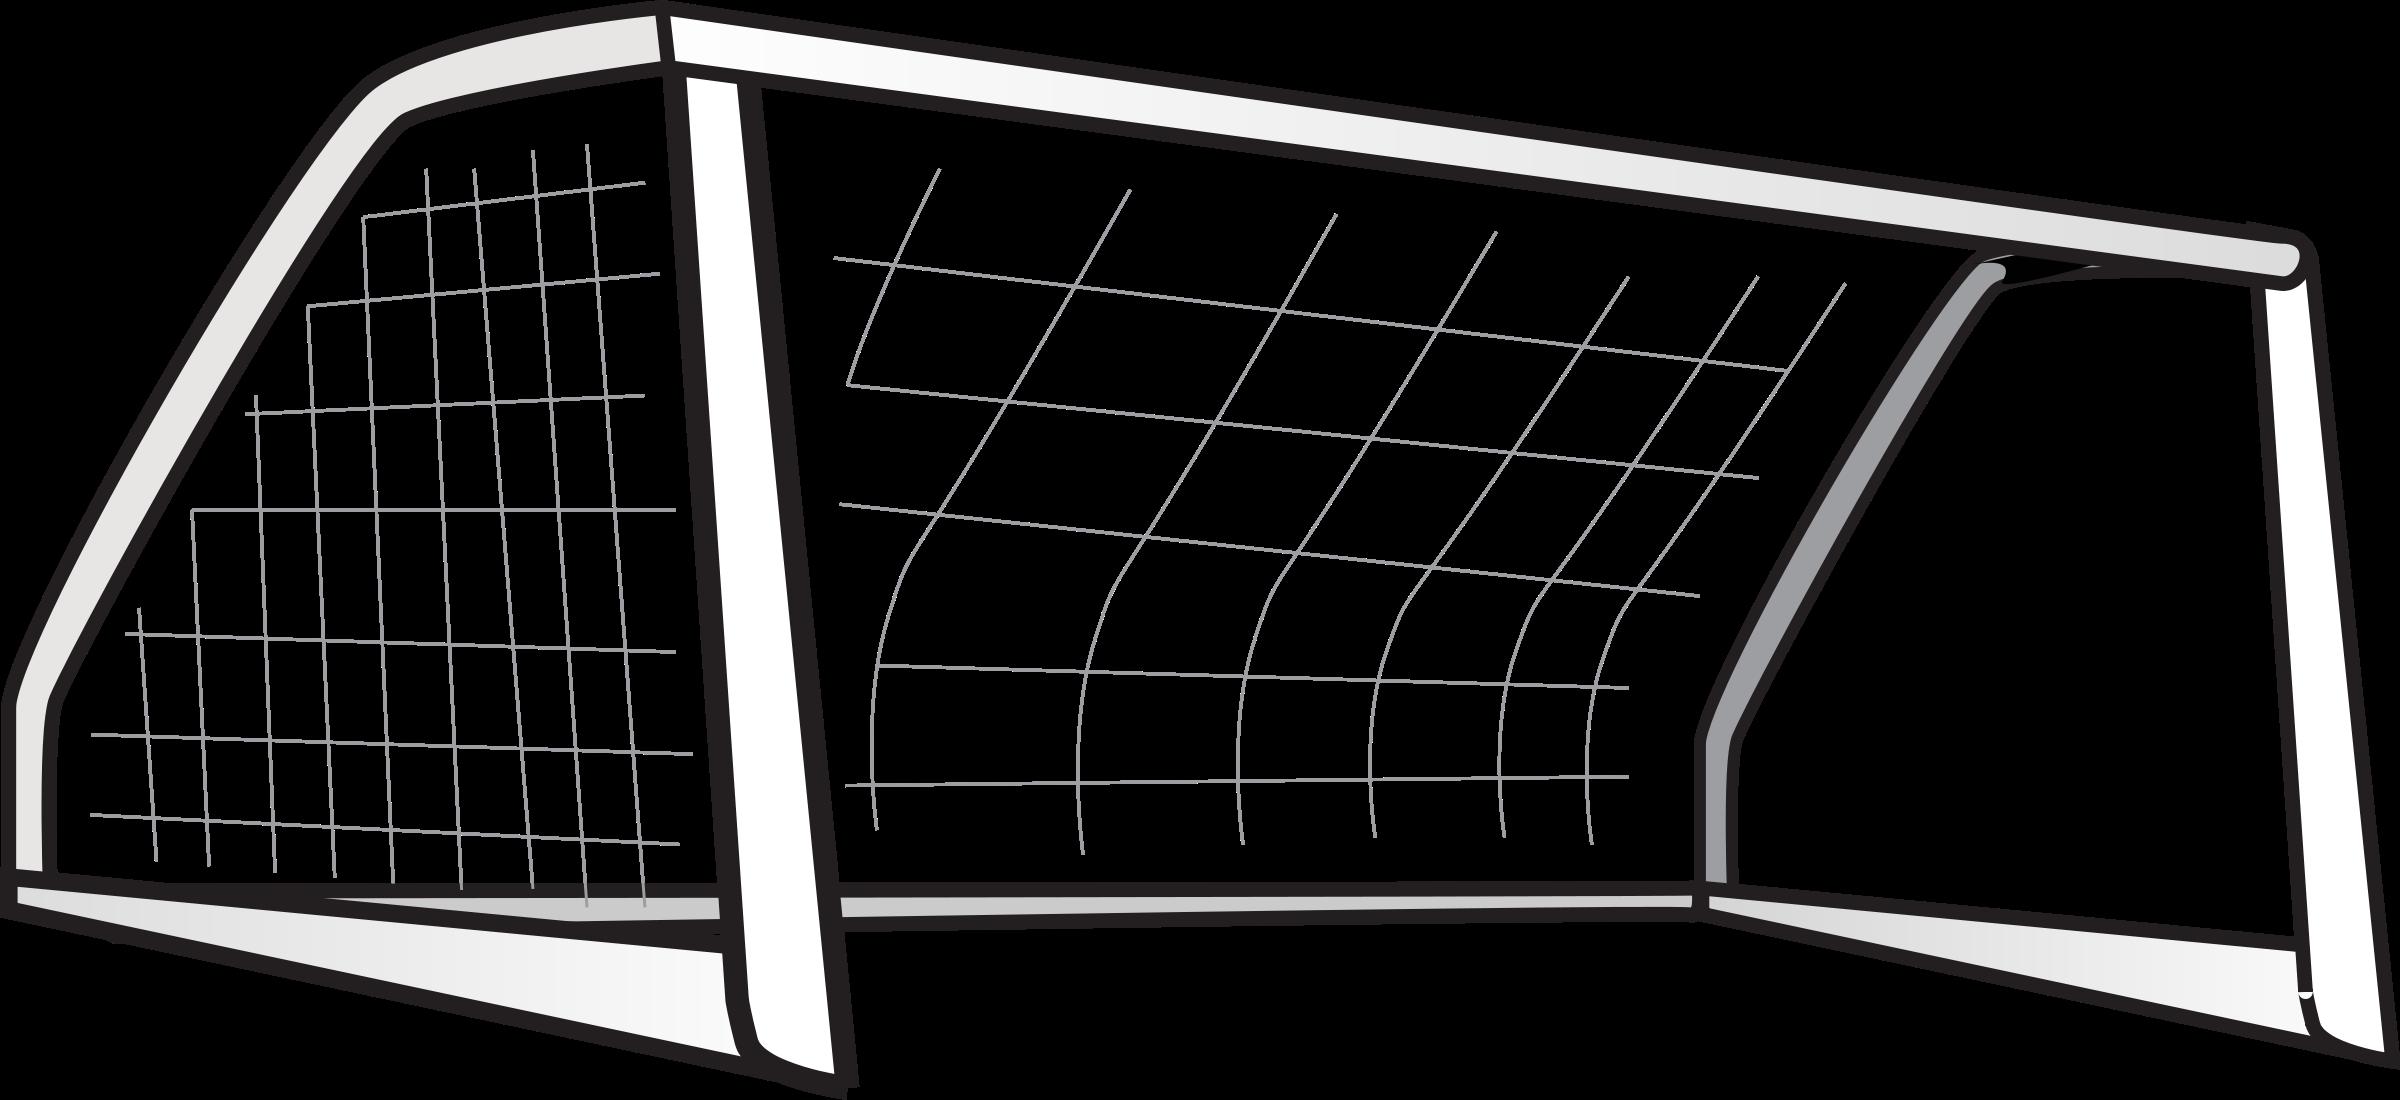 Clipart Football Goal Post Clipart Panda Free Clipart.